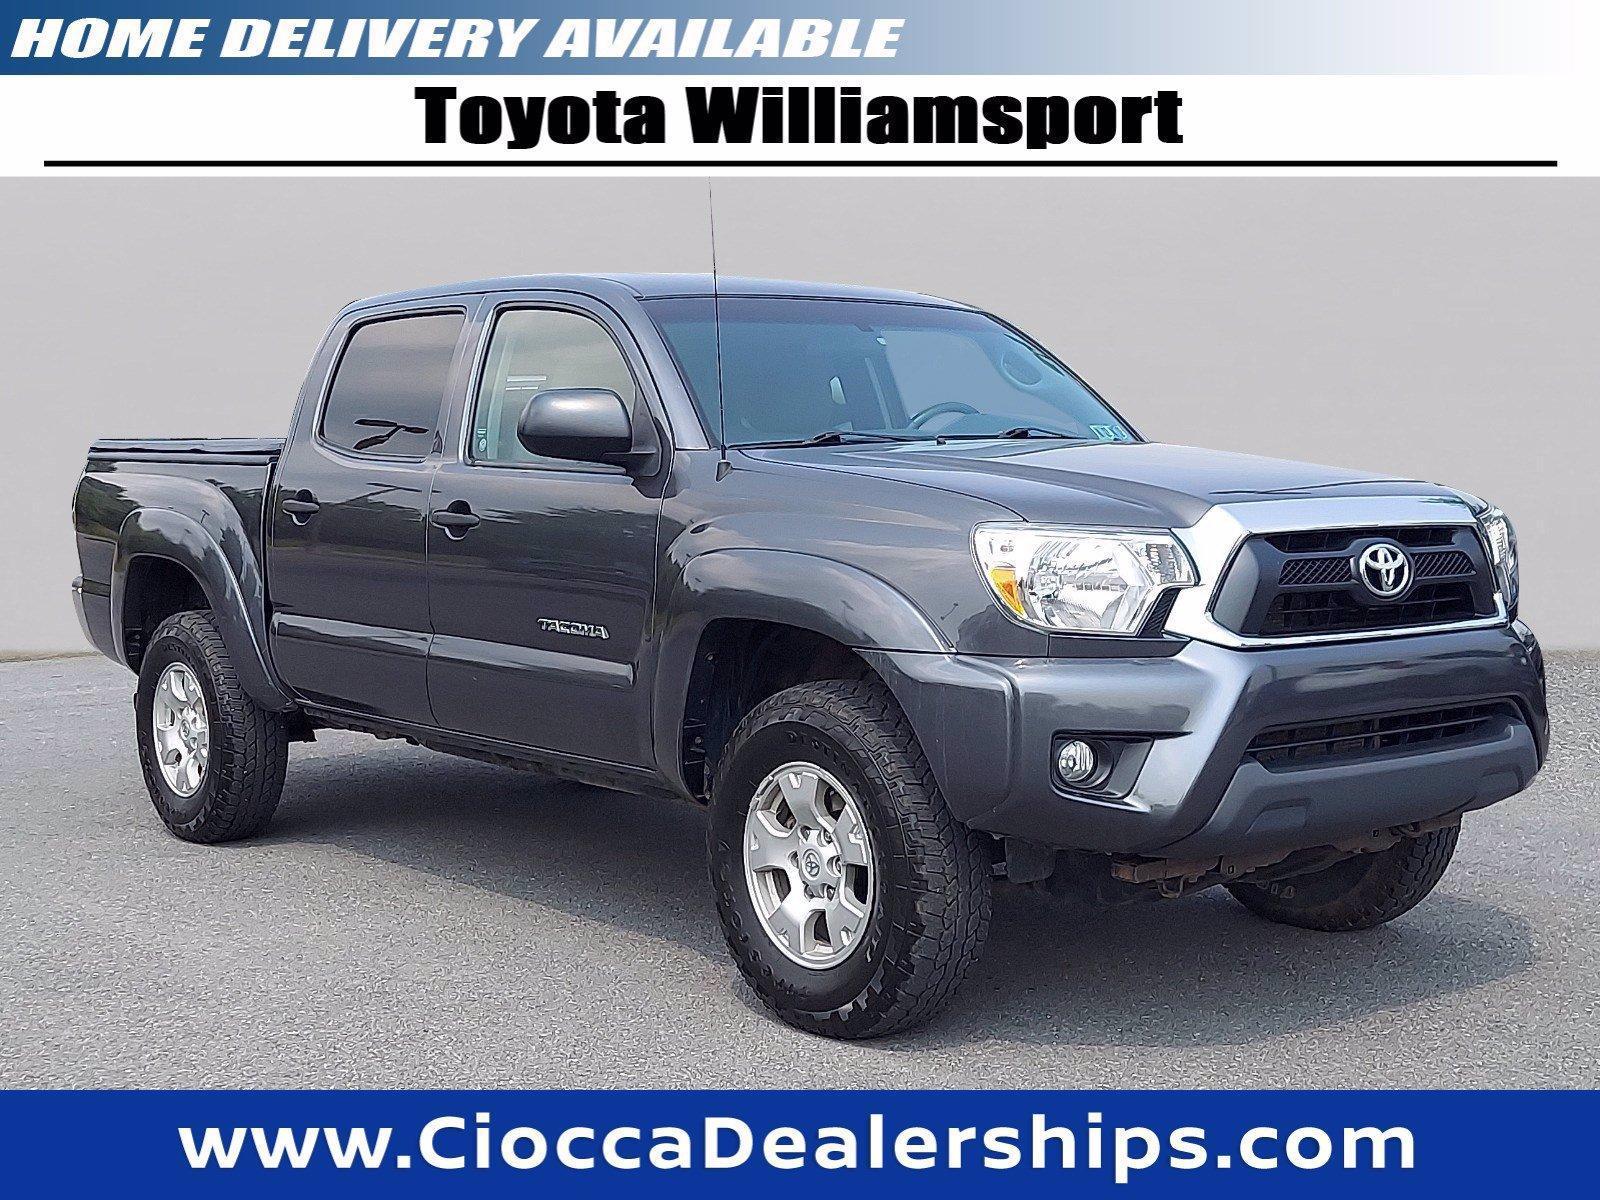 2014 Toyota Tacoma Vehicle Photo in Muncy, PA 17756